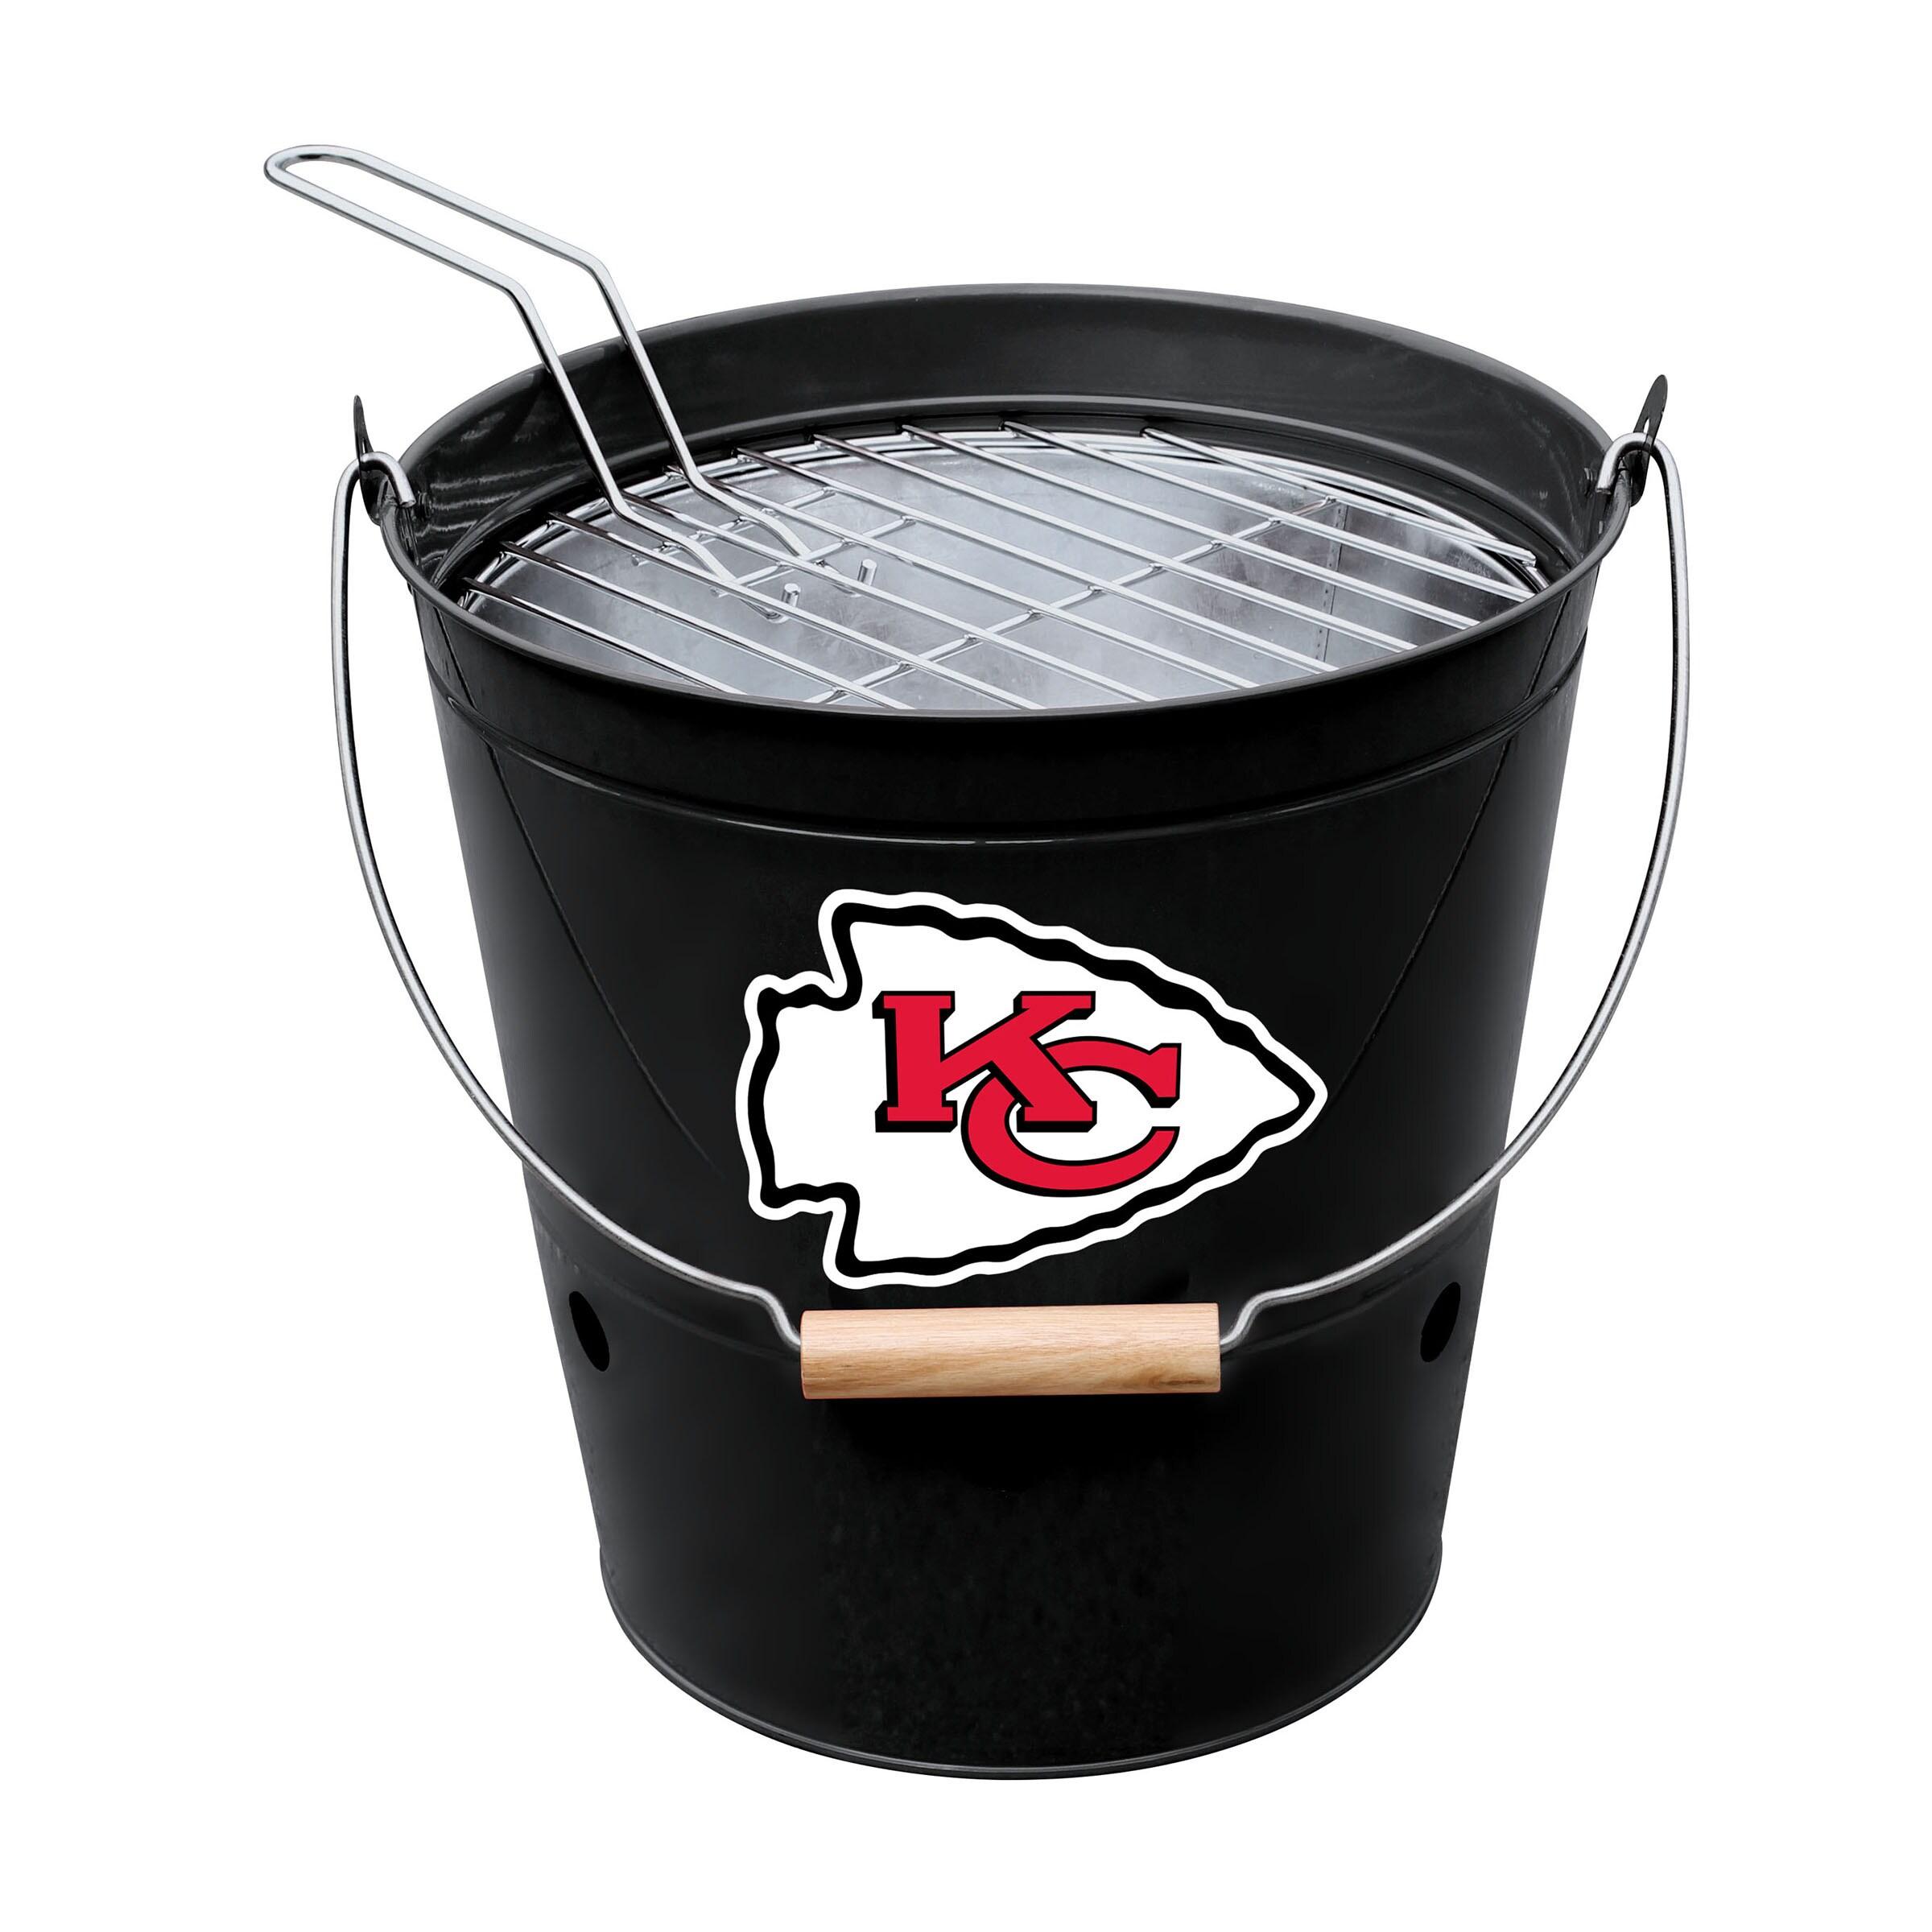 Kansas City Chiefs Imperial Bucket Grill - Black